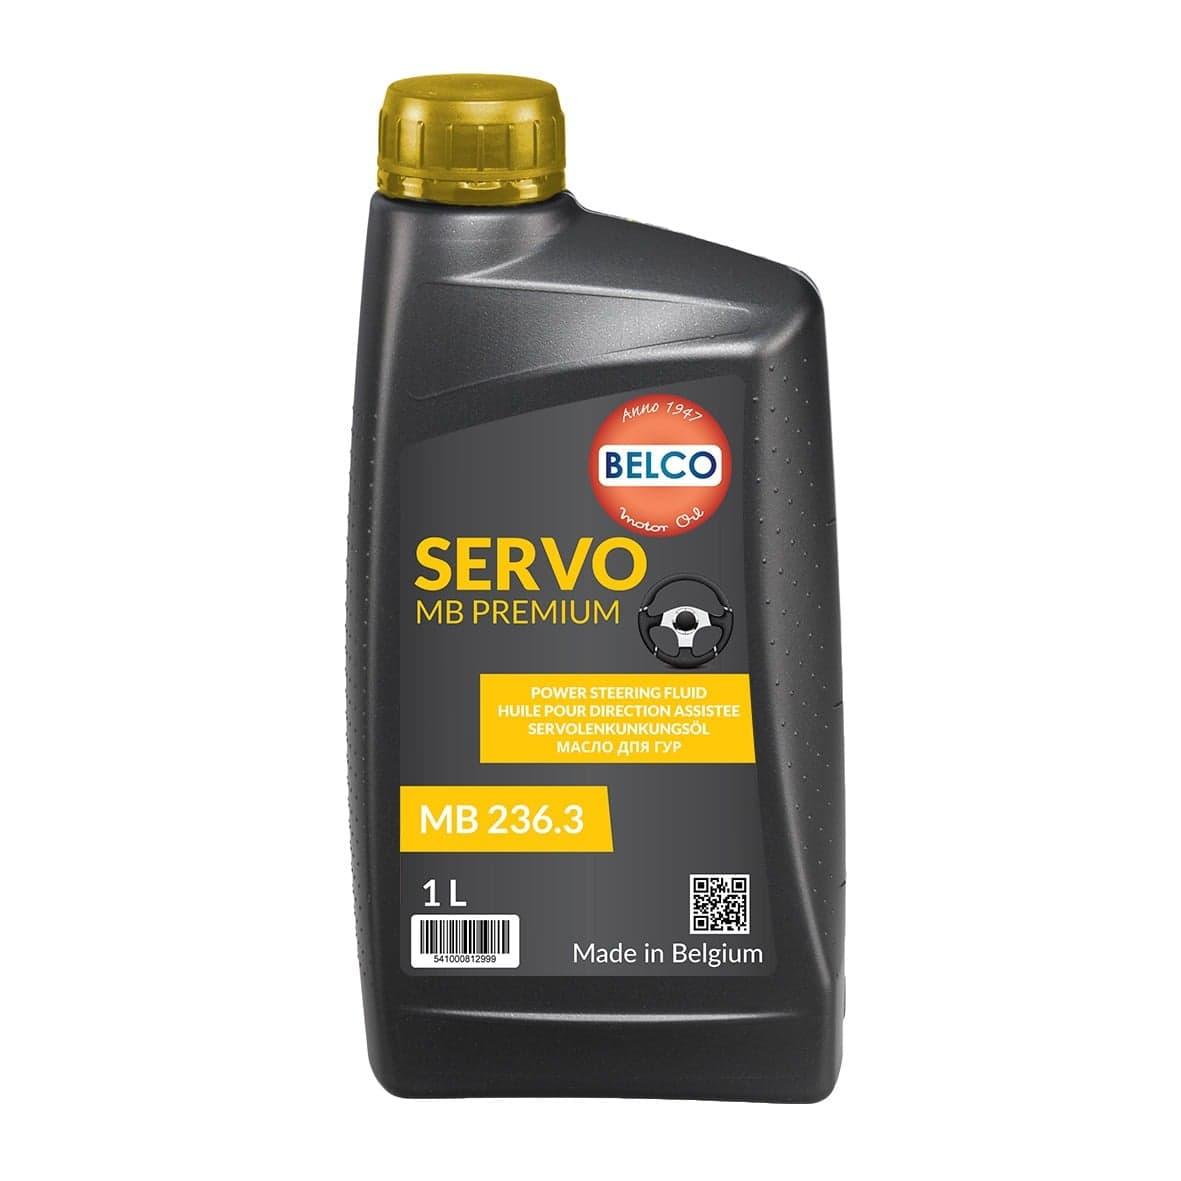 Servo MB Premium